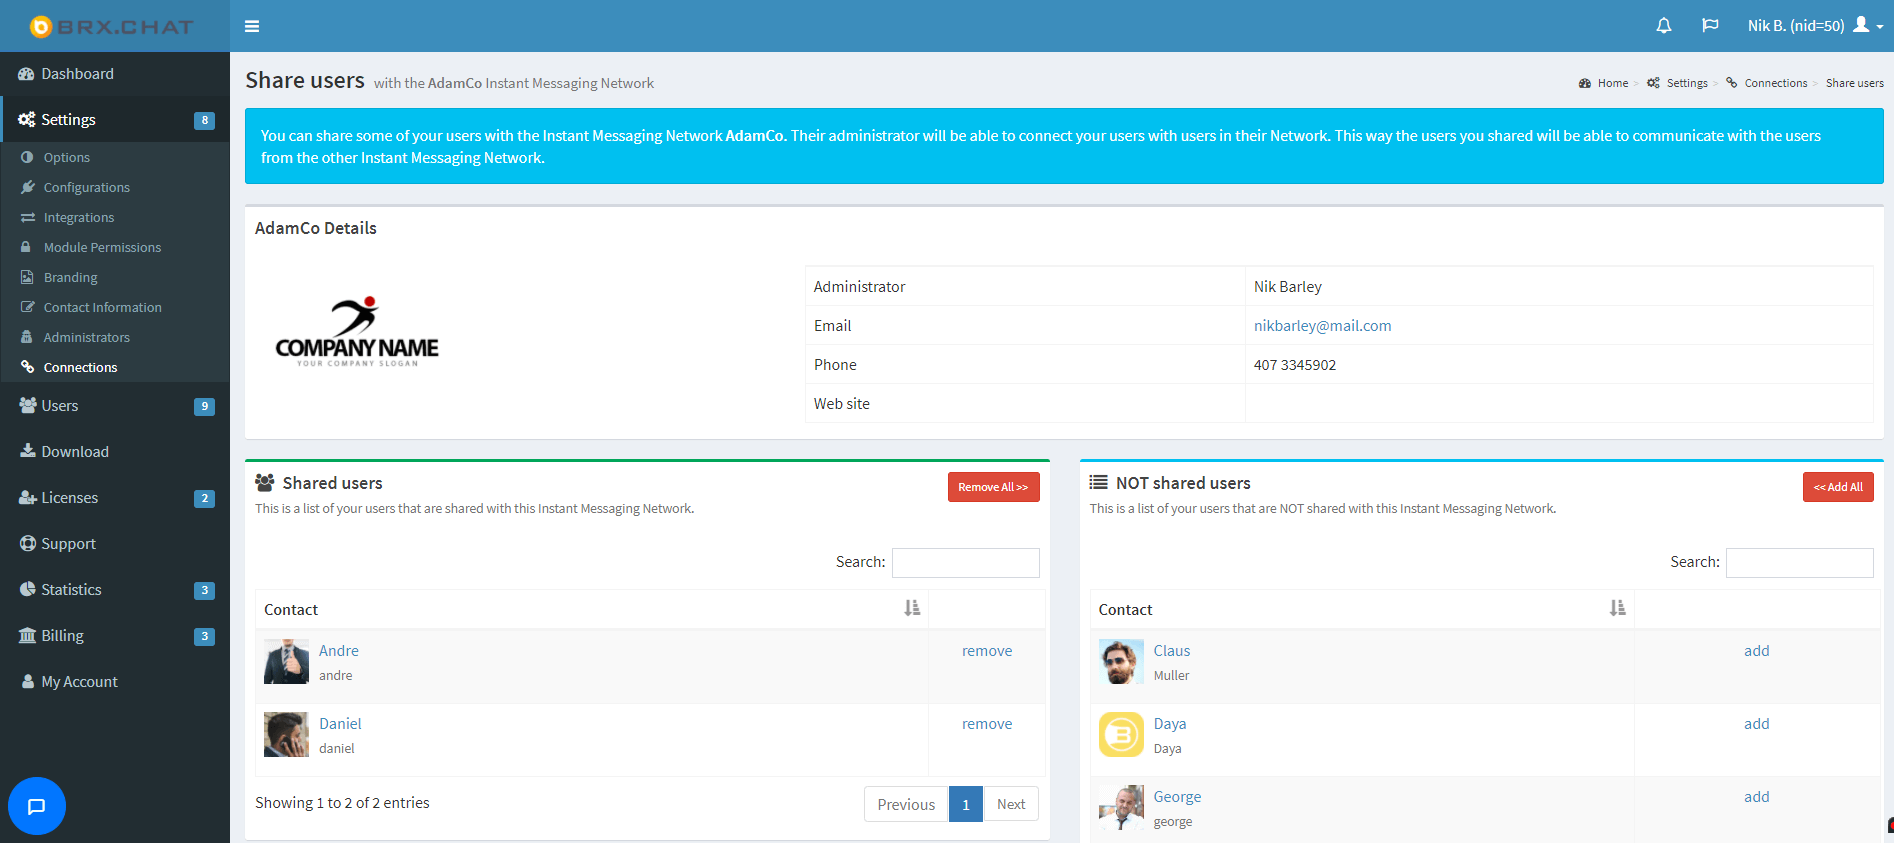 add or remove users